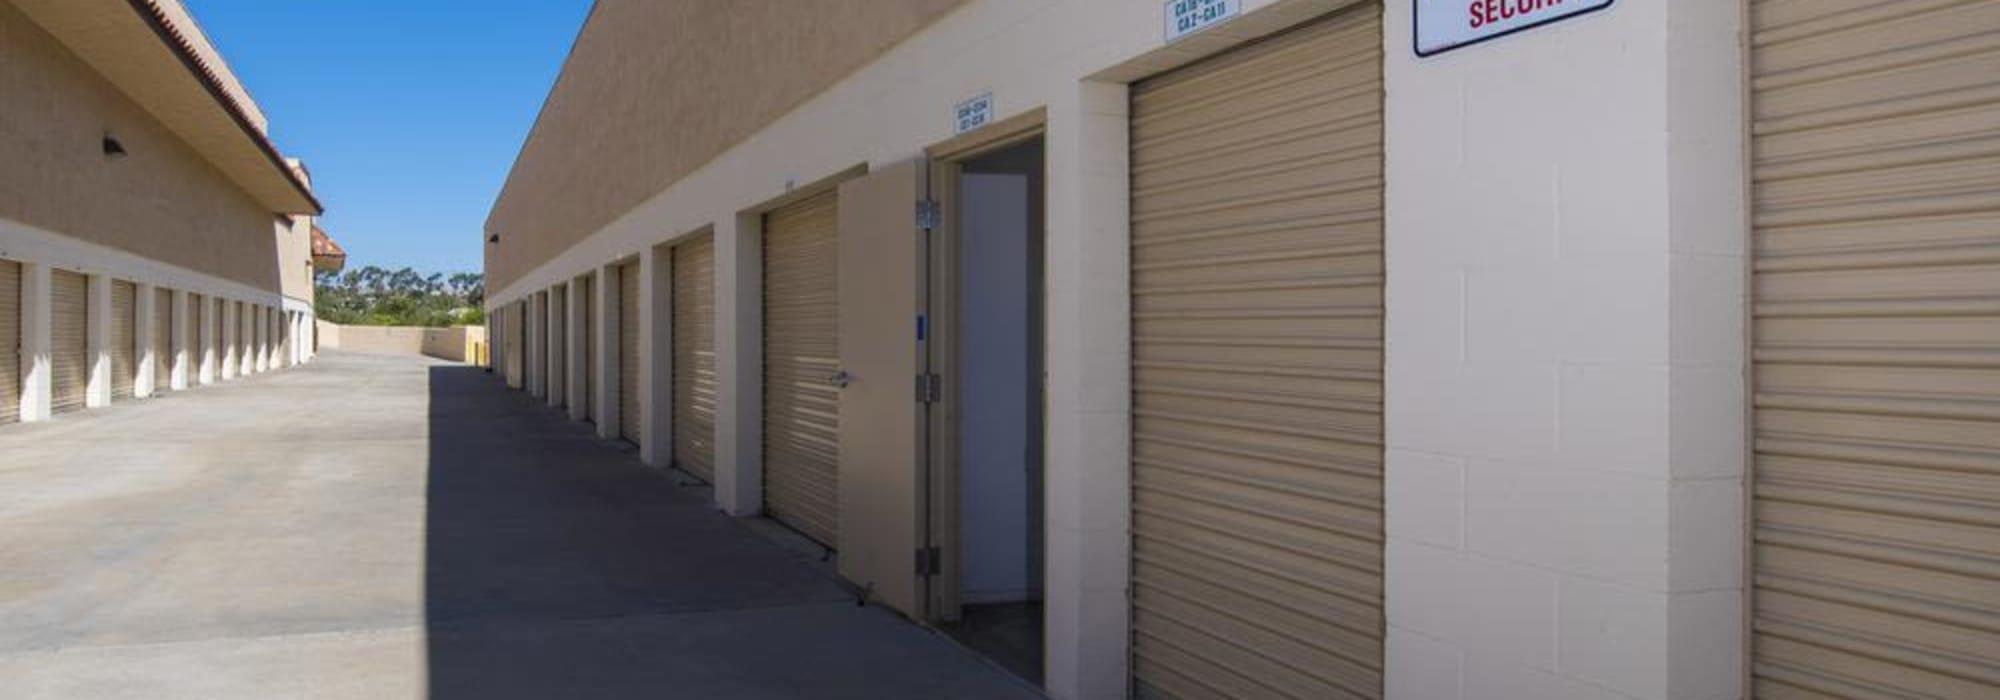 Outdoor units at Olivenhain Self Storage in Encinitas, California